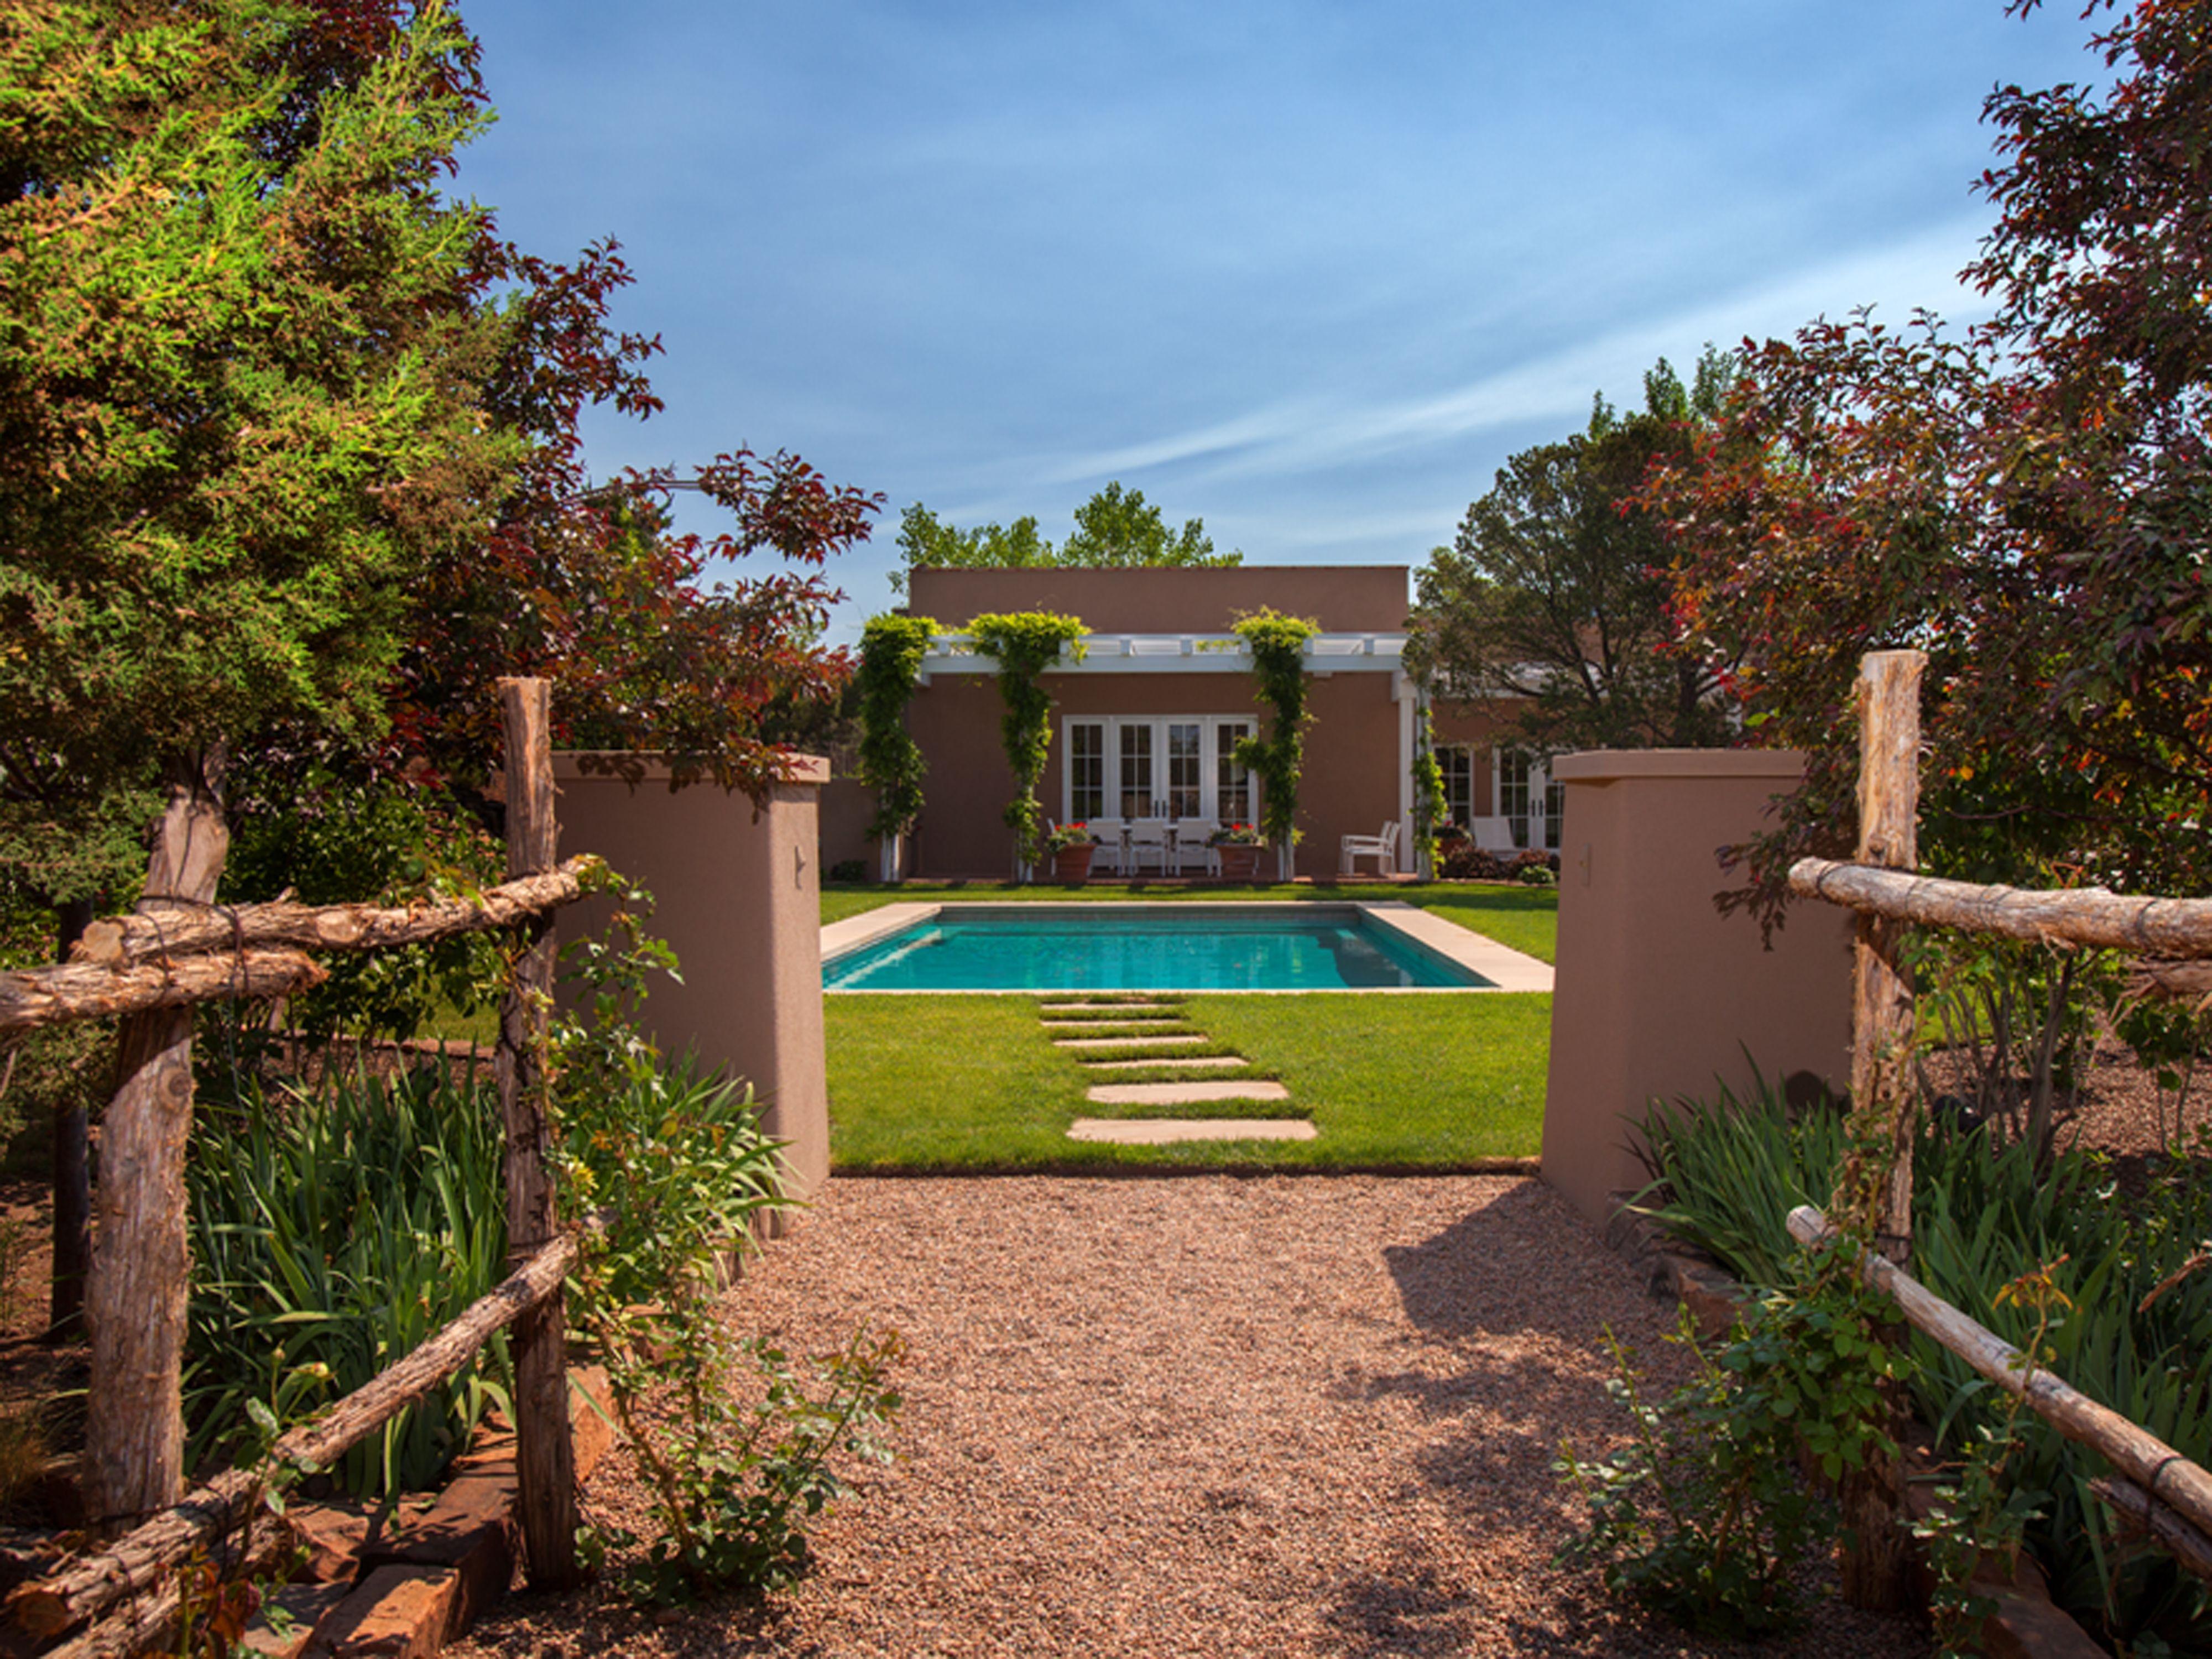 Step Inside A Stunning Adobe Home In Santa Fe New Mexico Homes Santa Fe Home Adobe House